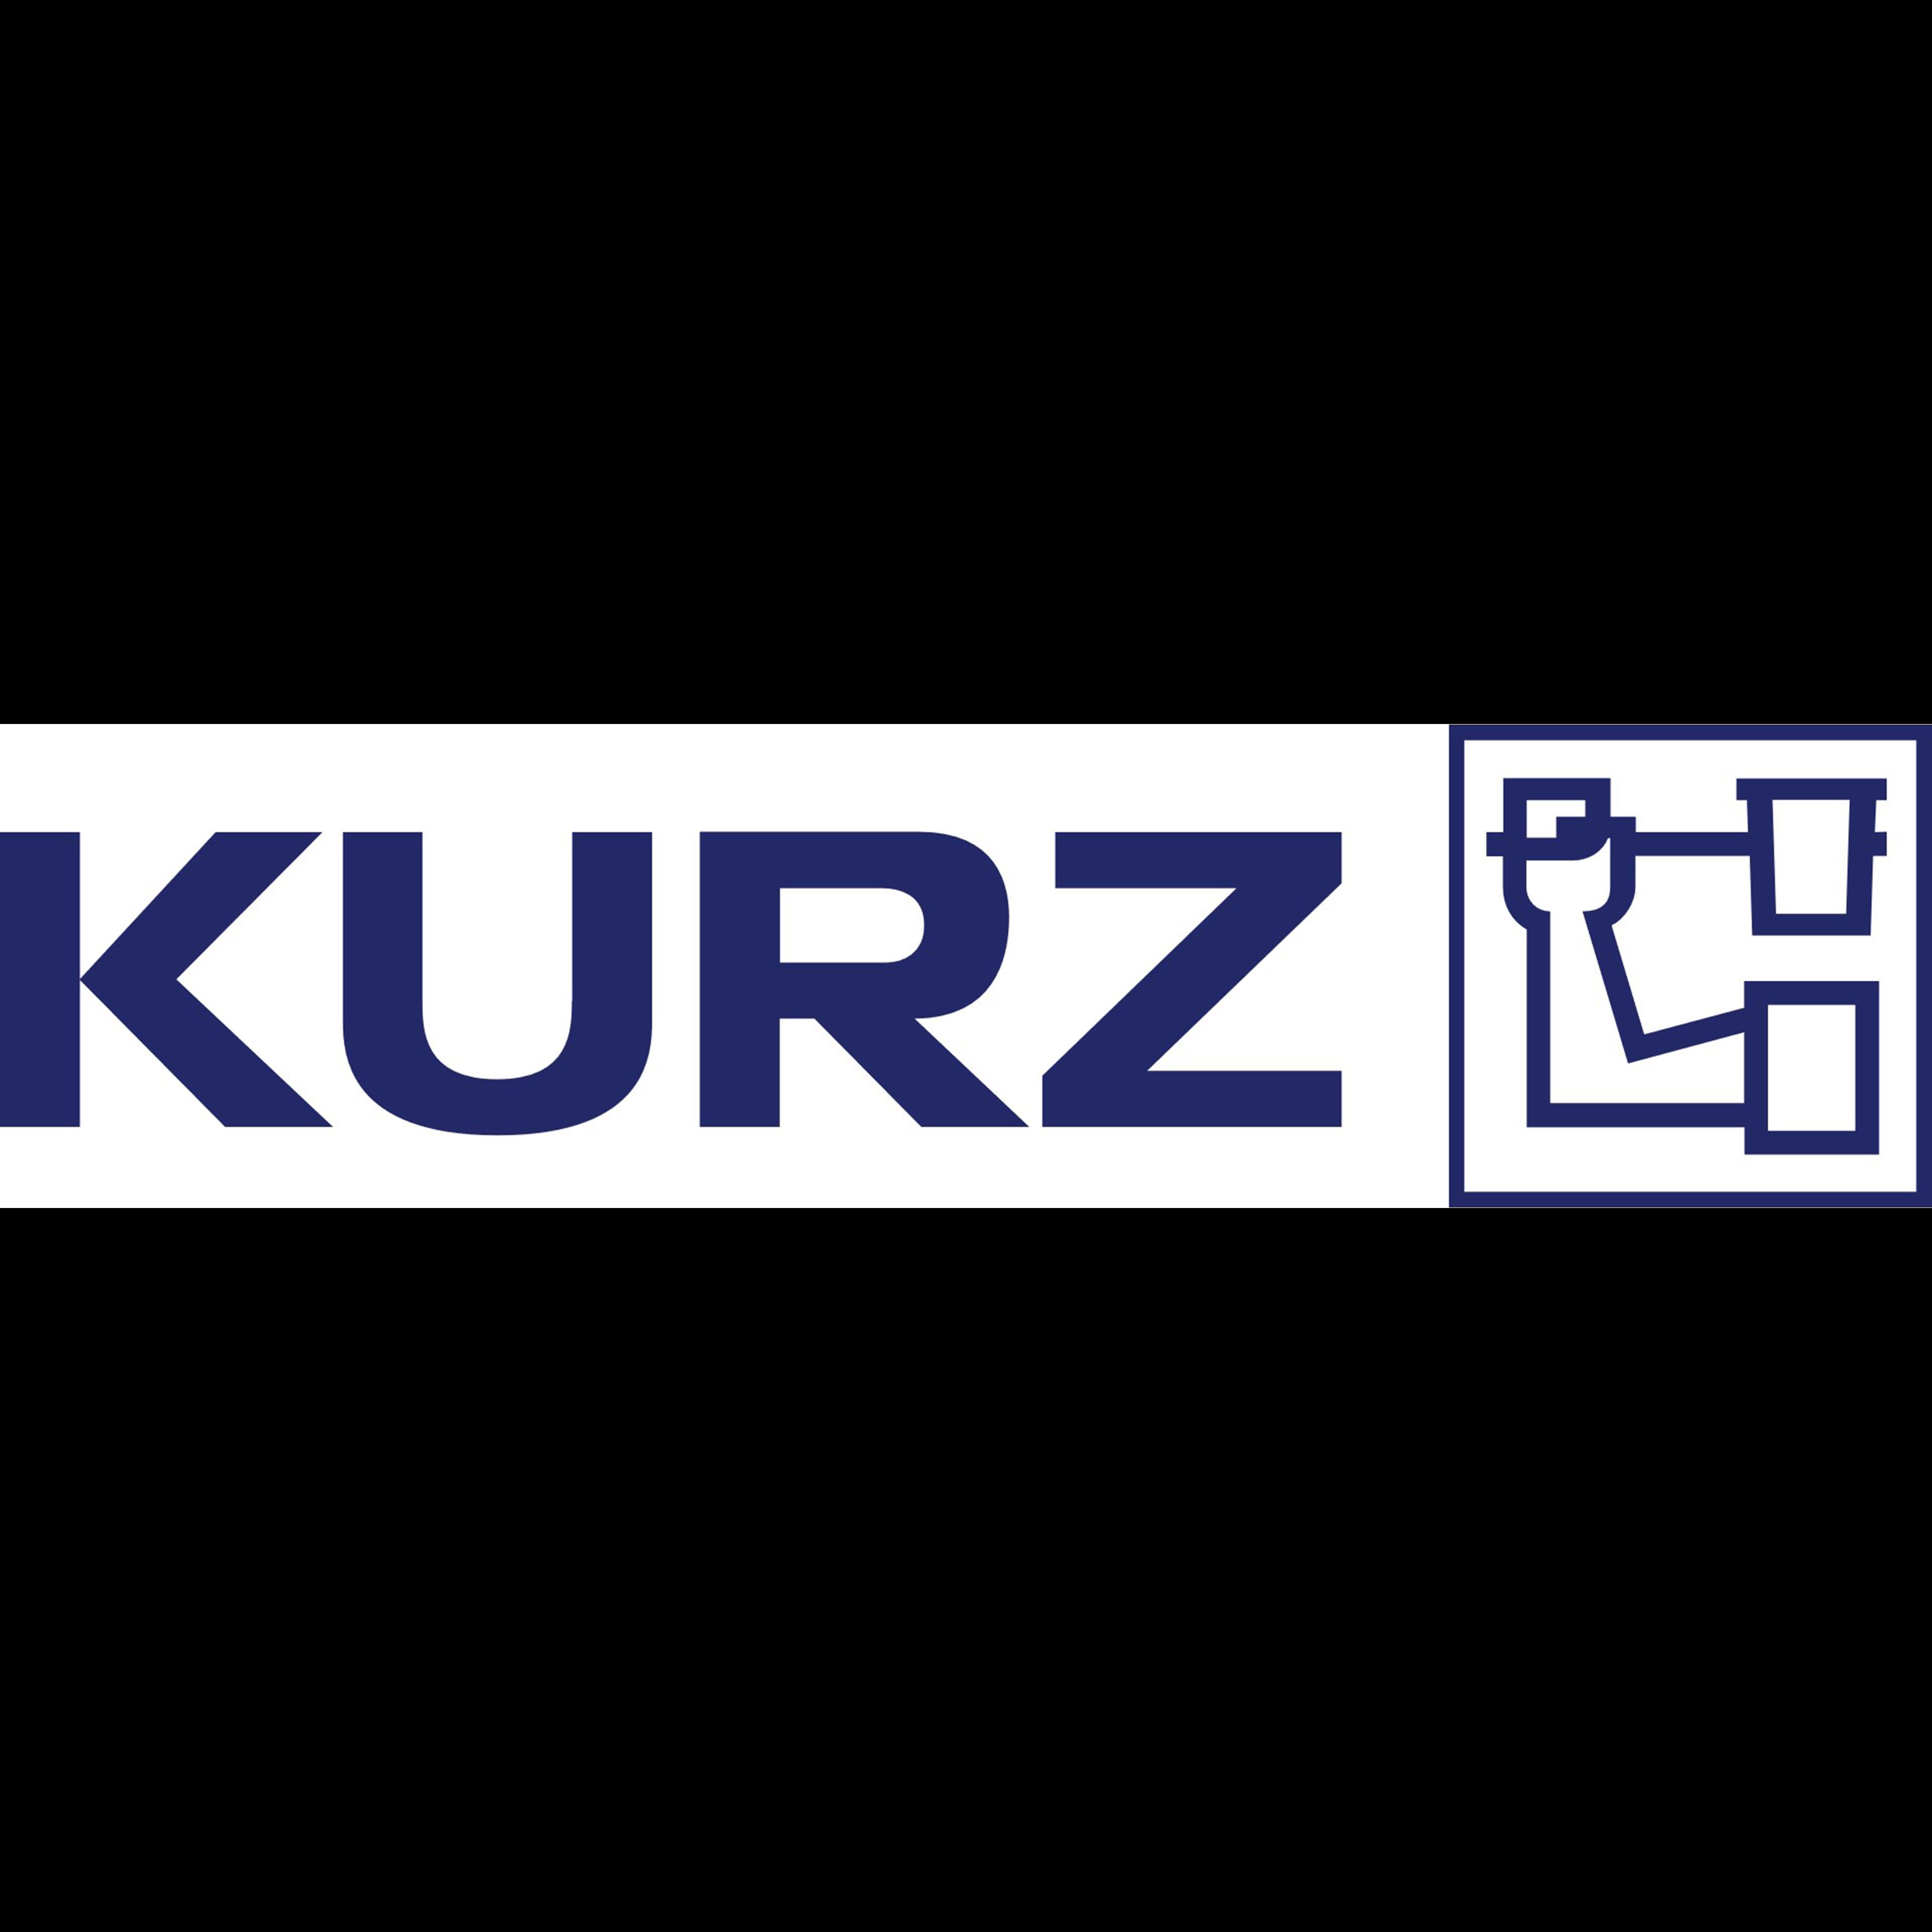 LEONHARD_KURZ_Stiftung&CO.KG_logo